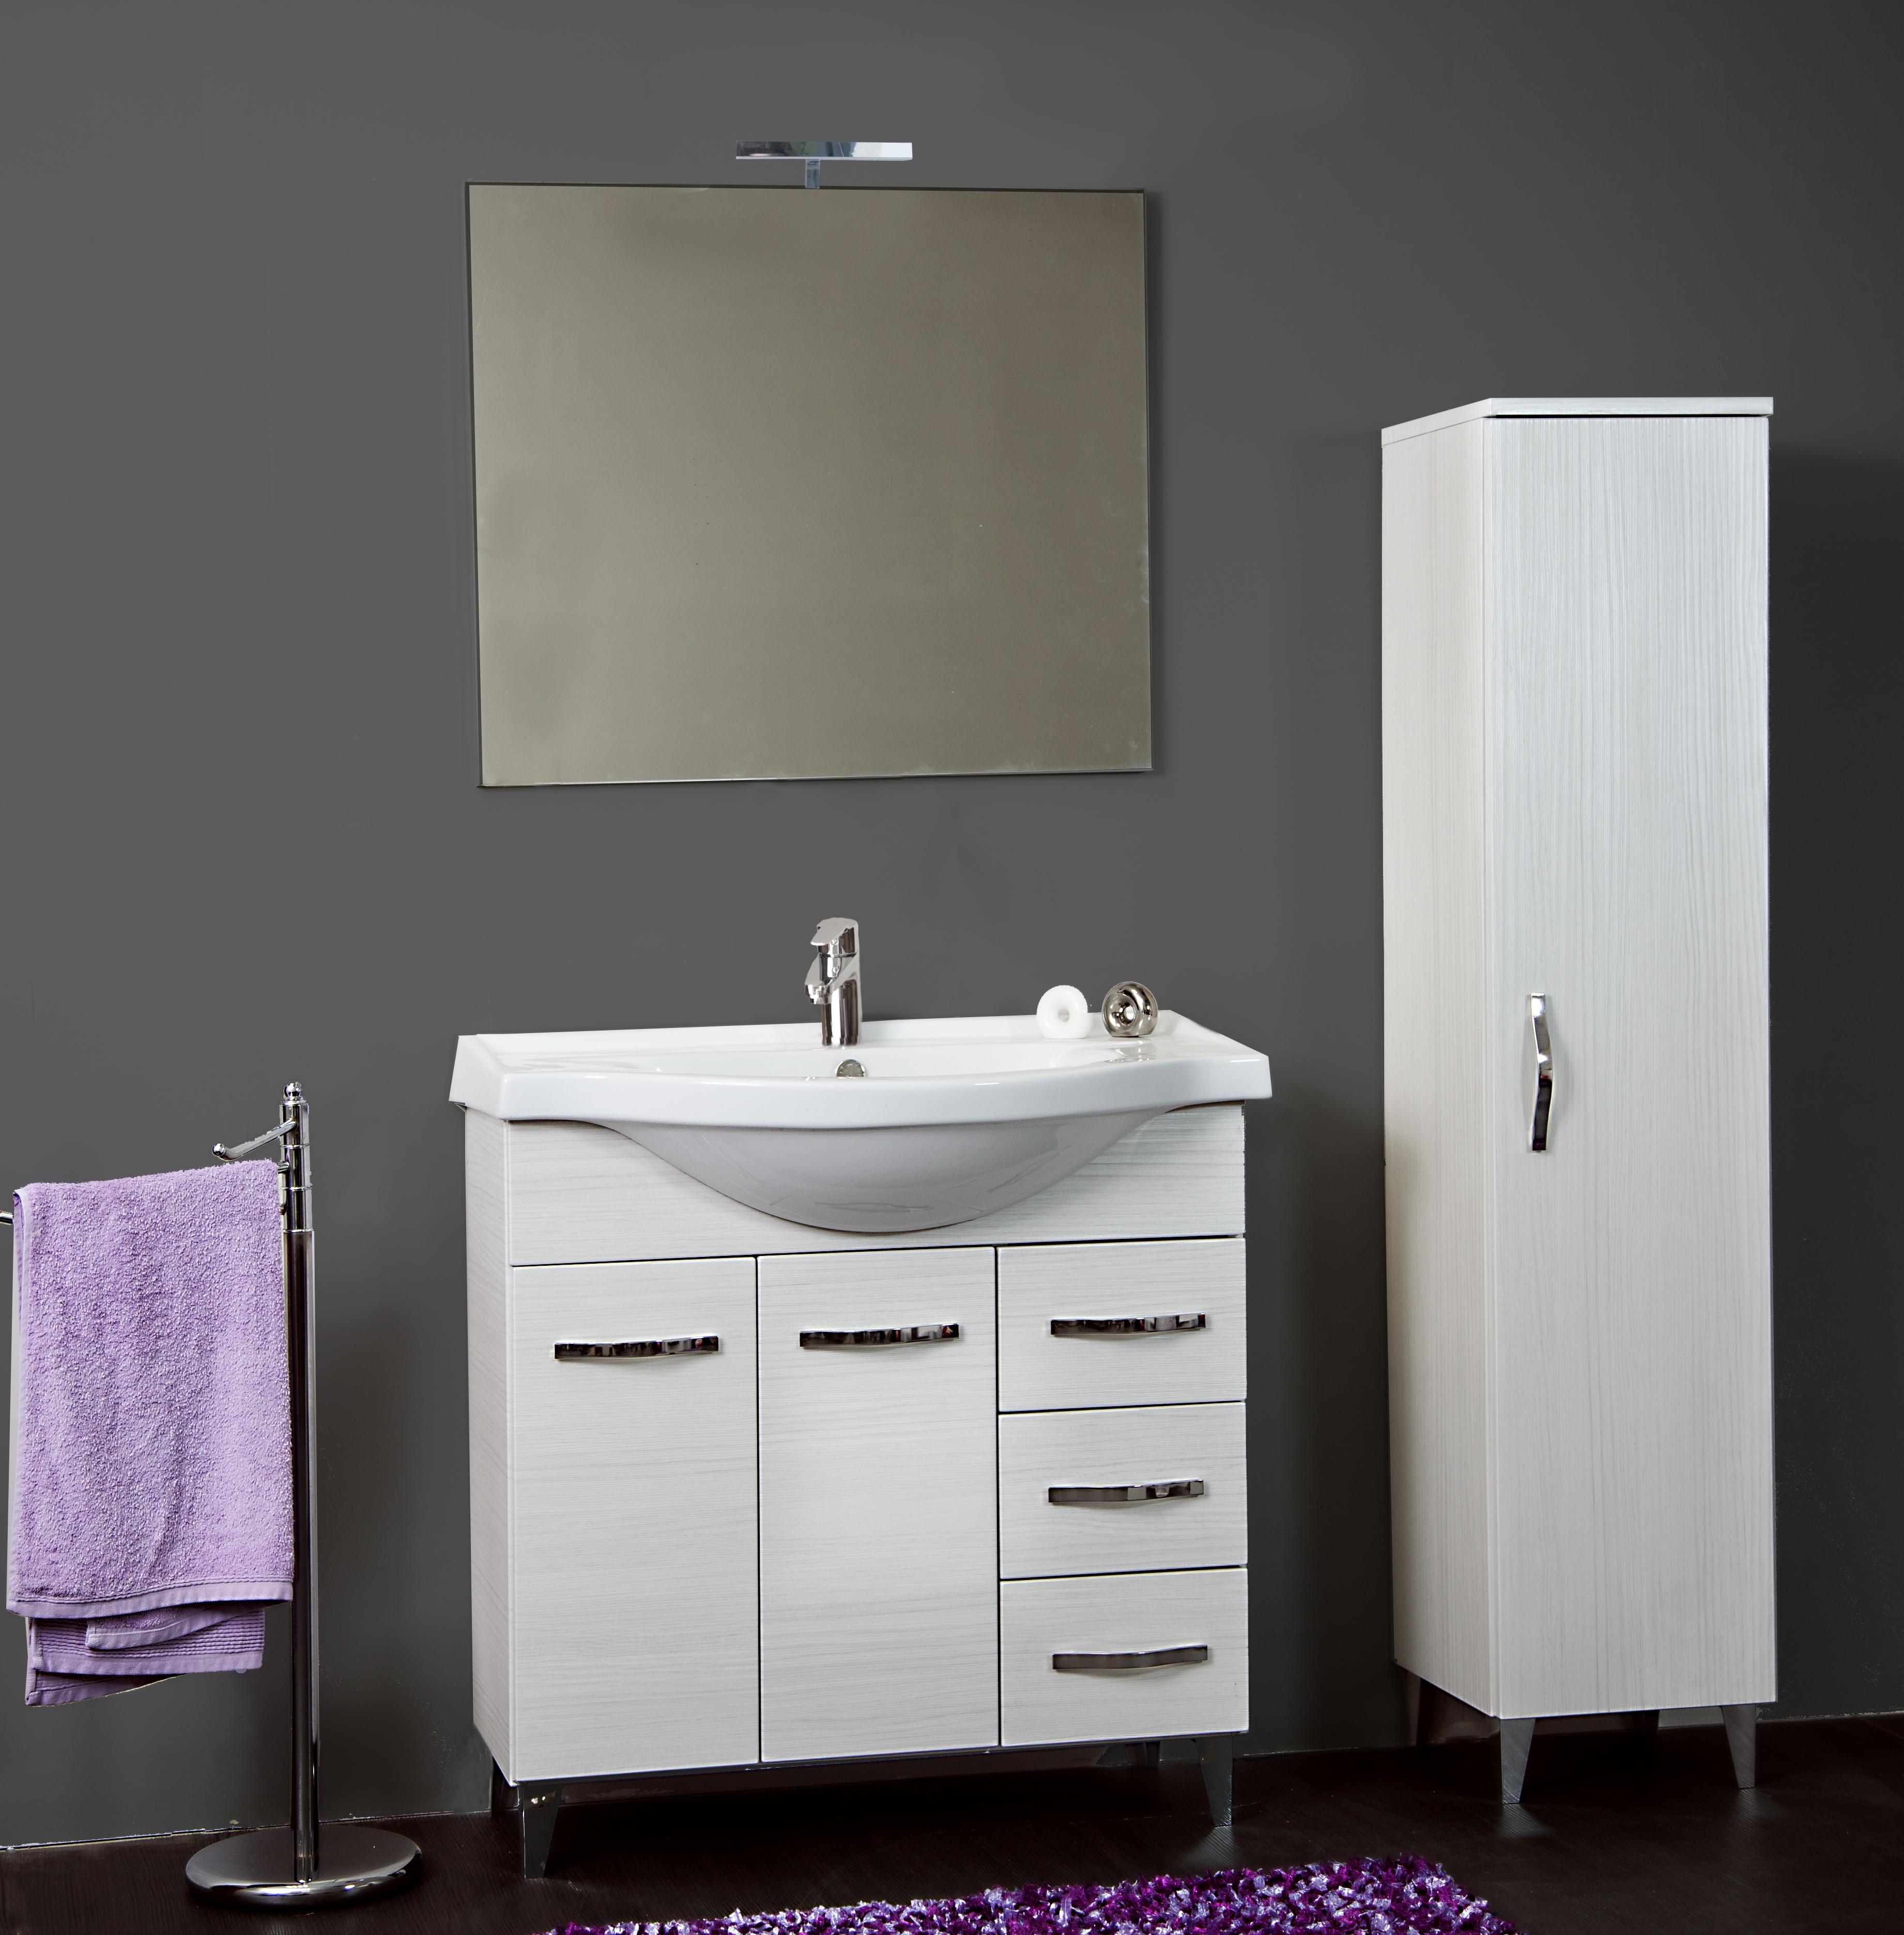 Complementi bagno delait design light decor - Complementi bagno ...